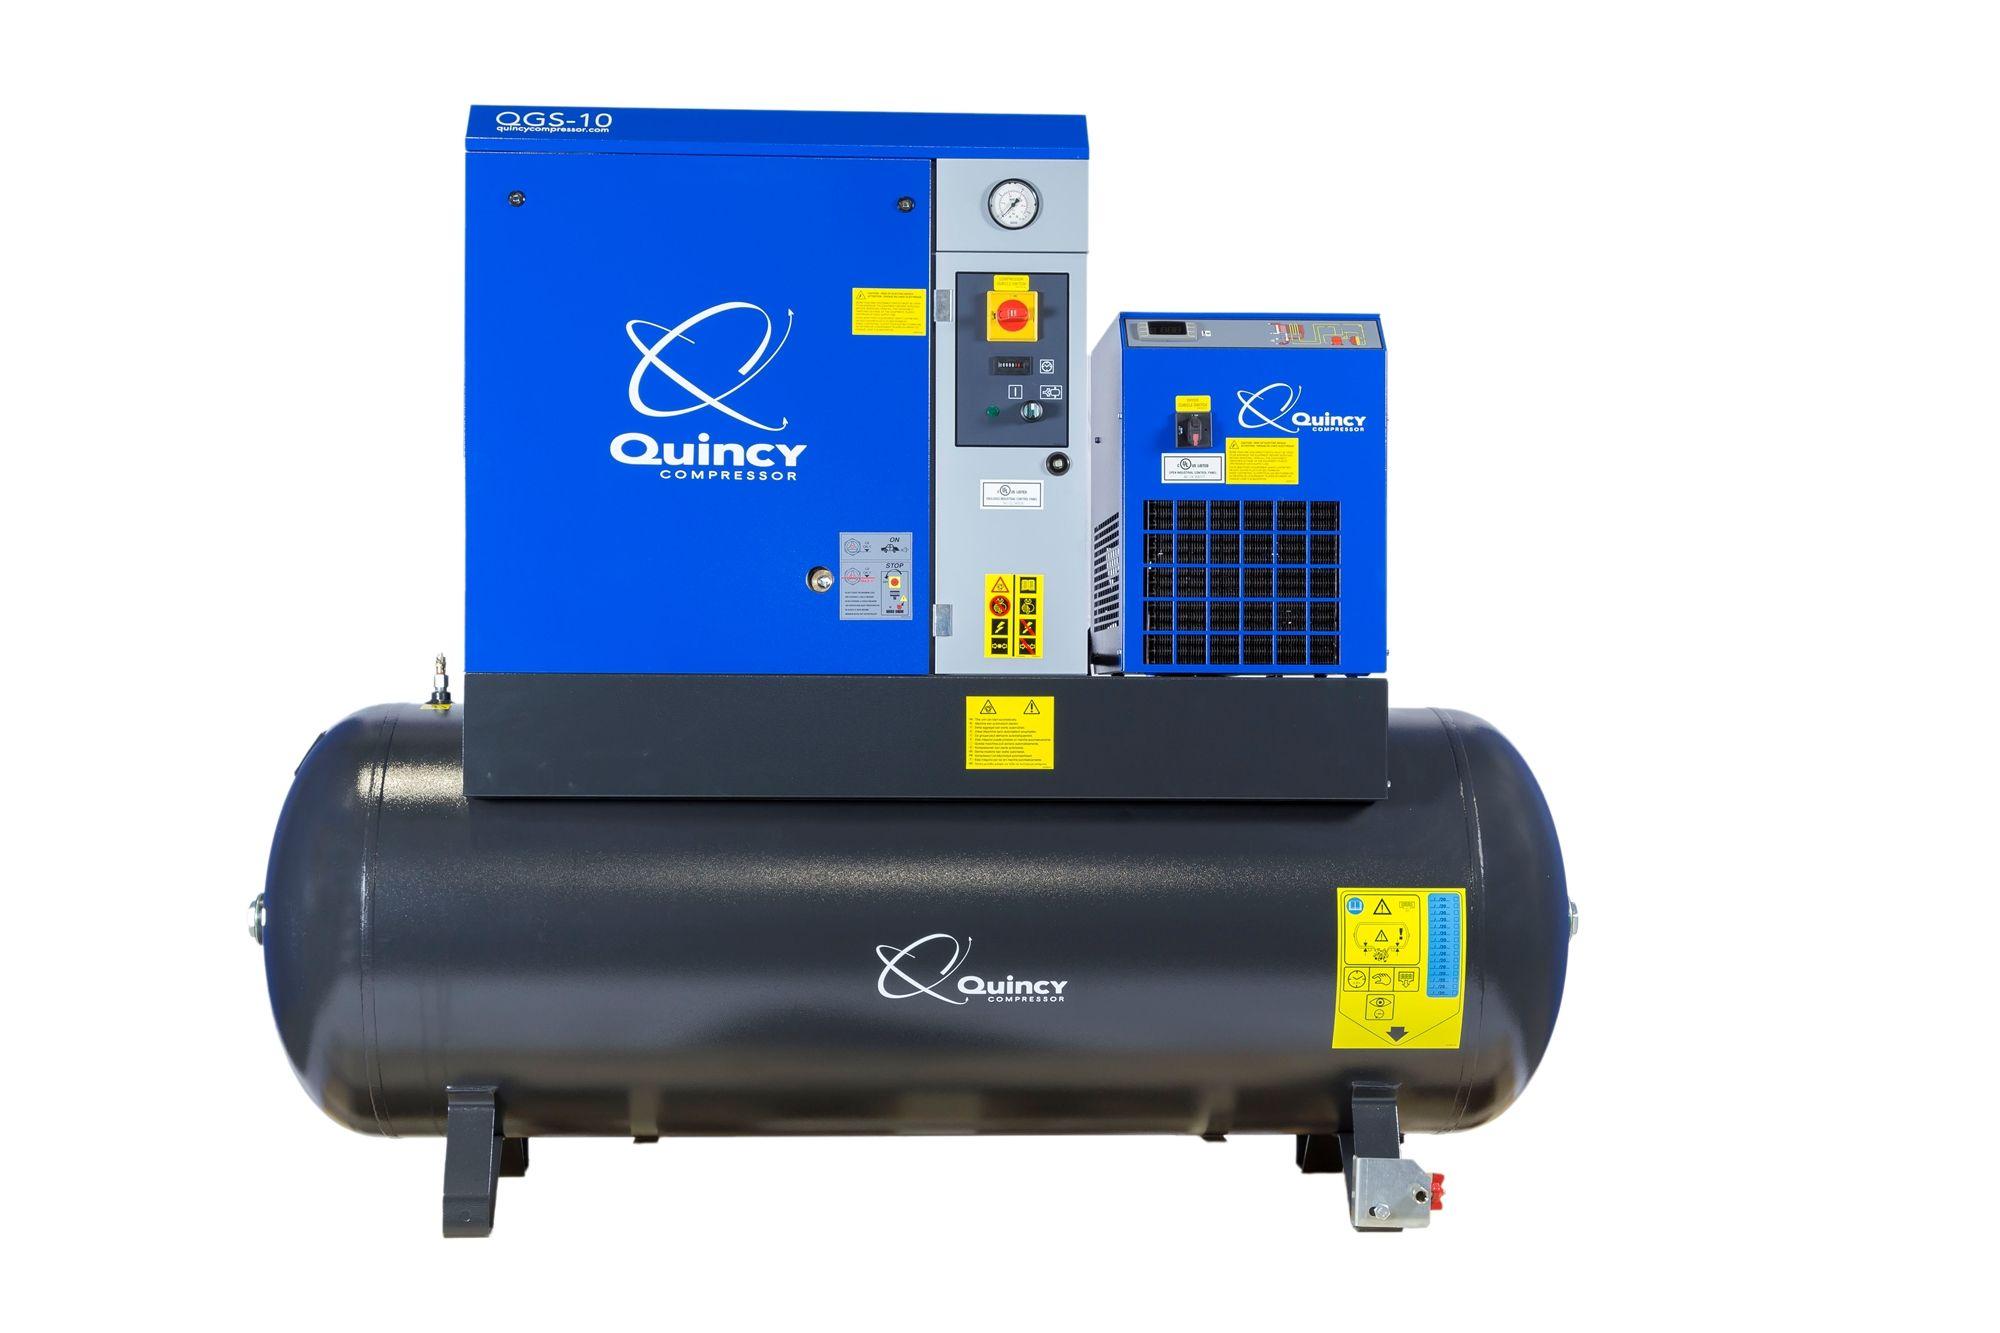 Quincy Qgs 10 Hpd 10 Hp Rotary Screw Air Compressor 120